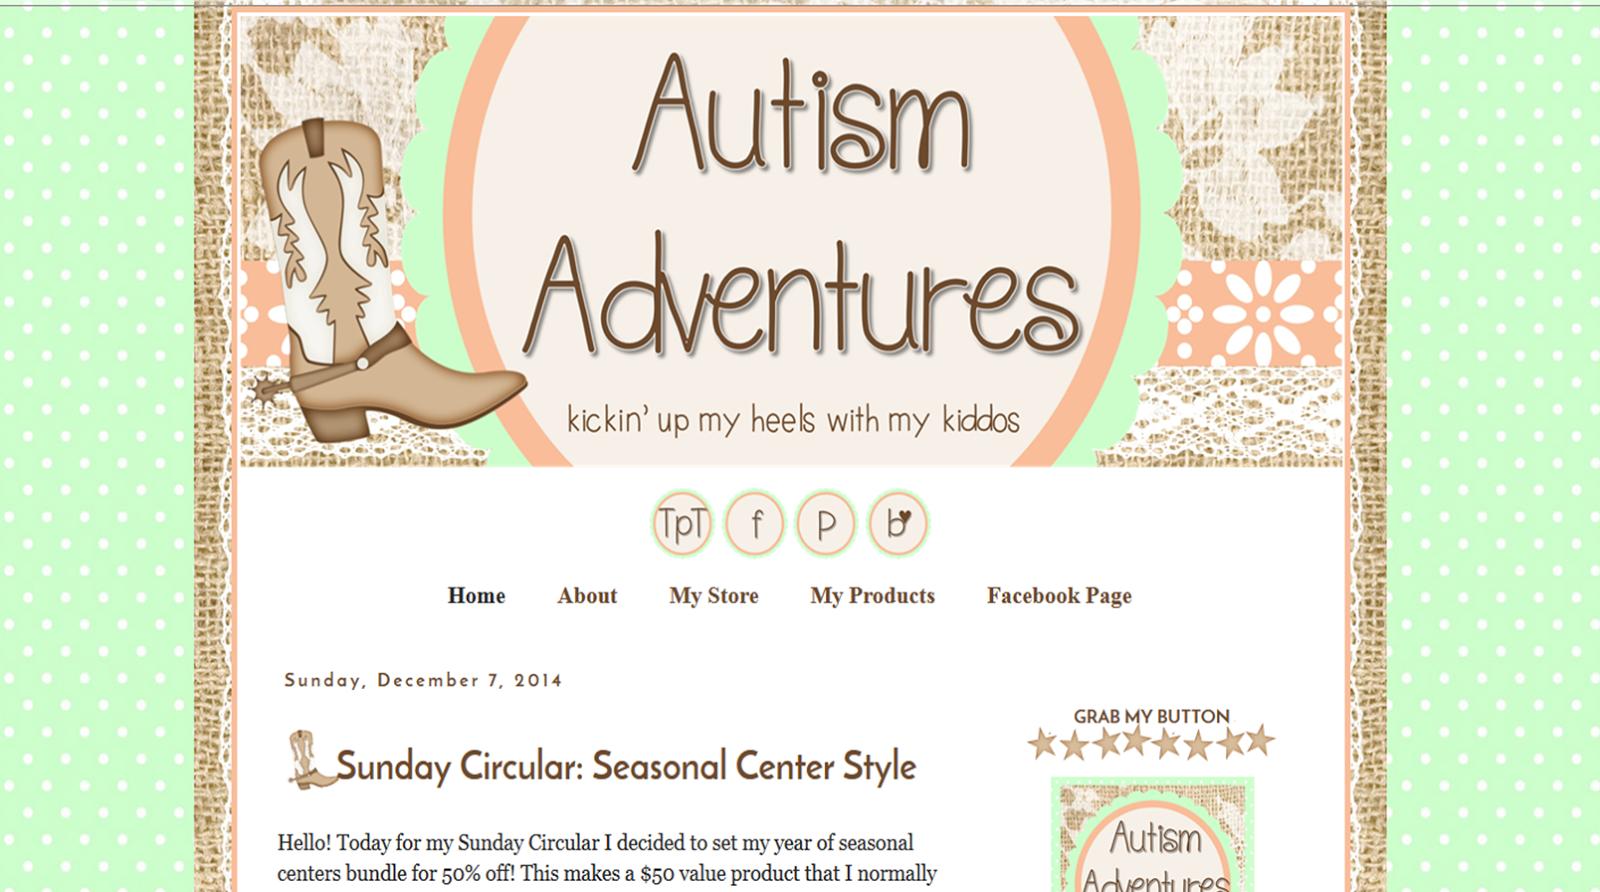 http://adventuresautism.blogspot.com/